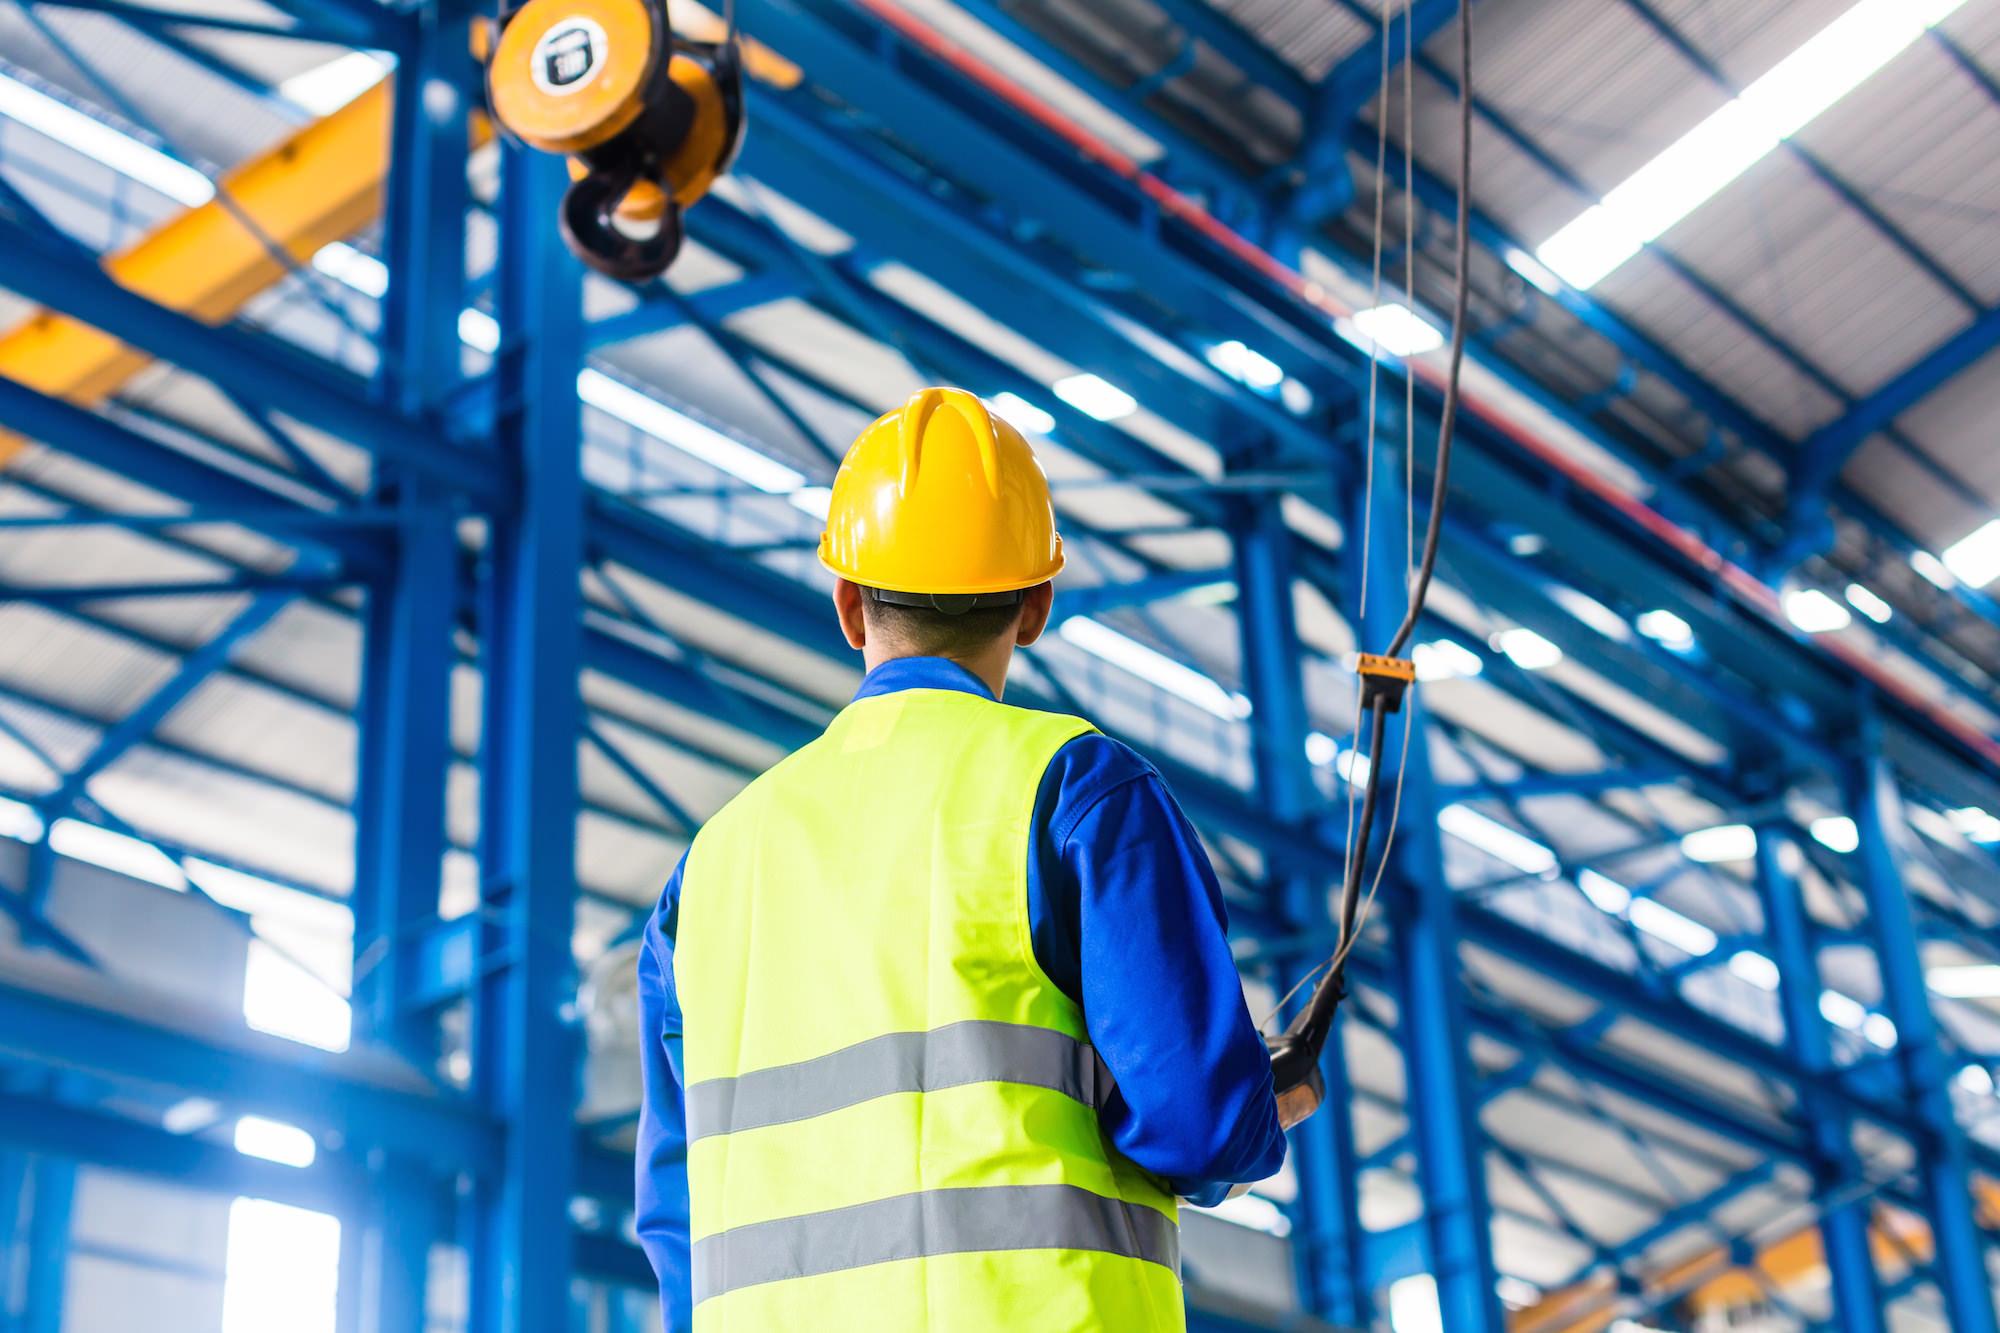 Ipd Industrie Personal Dienstleistung